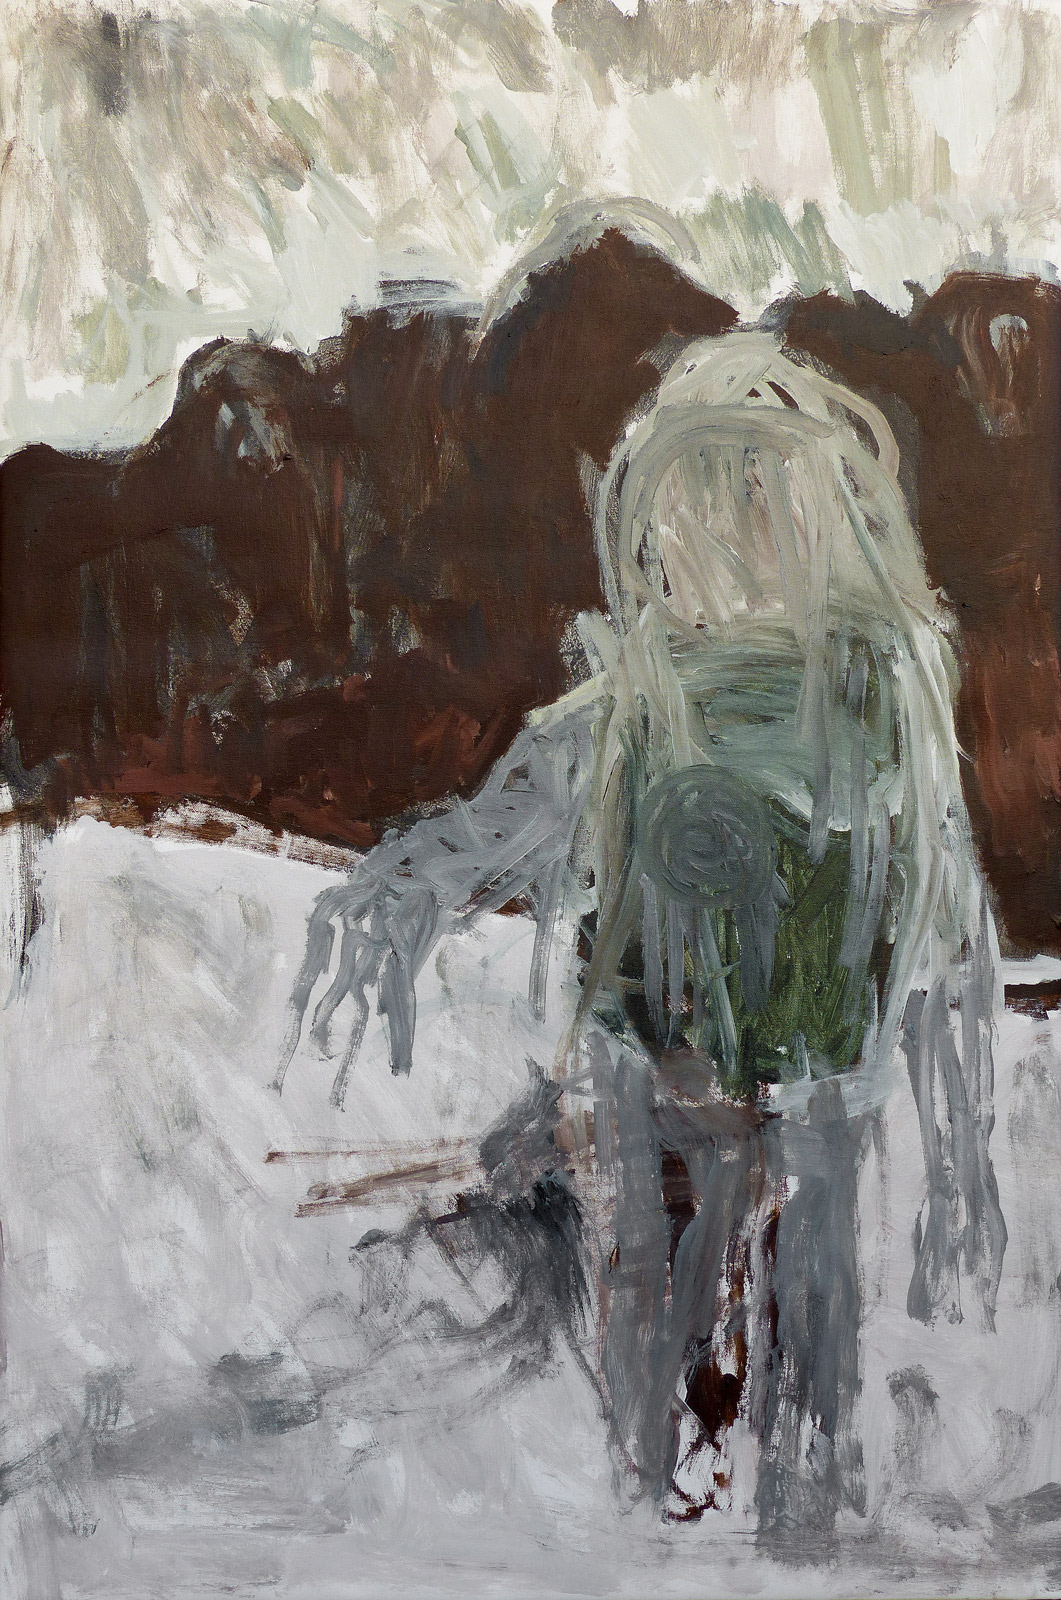 Grandson (postcard from the moon)  Acrylic on canvas 120x80cm  2019